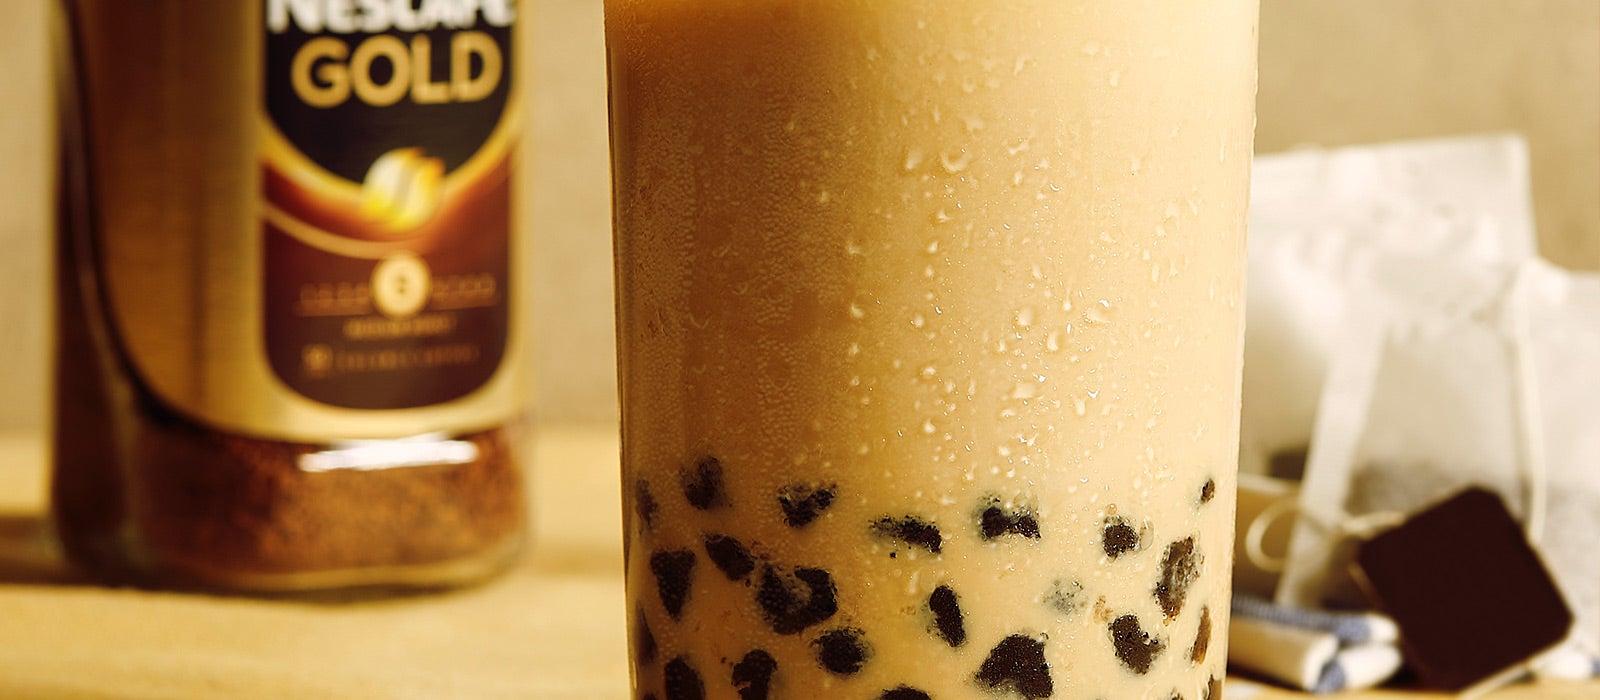 nescafe-gold-Iced-Milk-Tea-Coffee-with-Pearls-recipe-banner.jpg